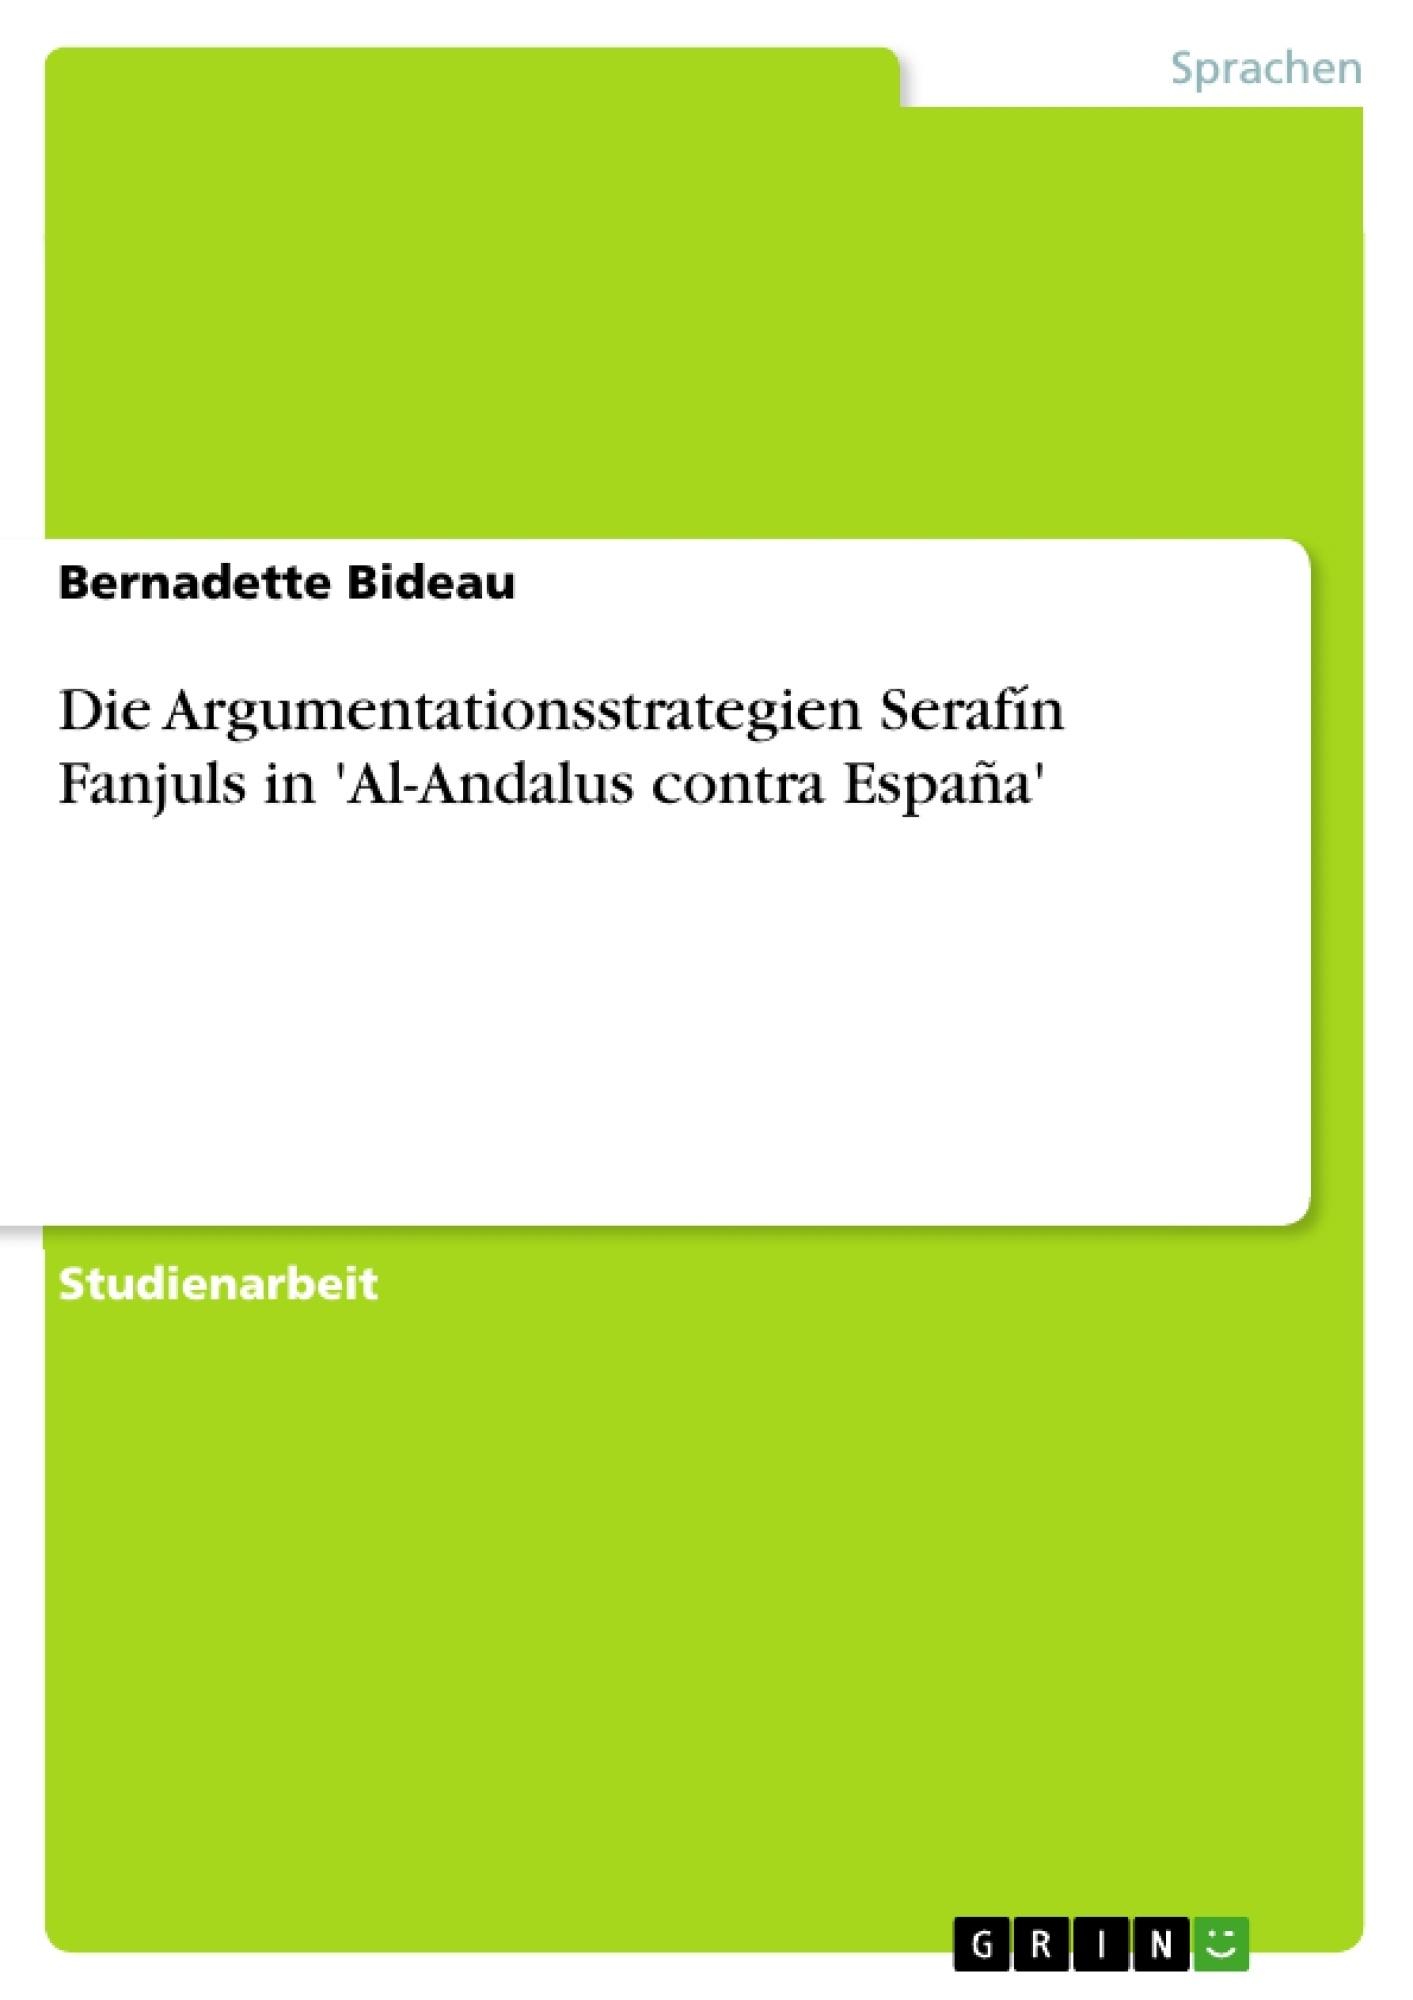 Titel: Die Argumentationsstrategien Serafín Fanjuls in 'Al-Andalus contra España'